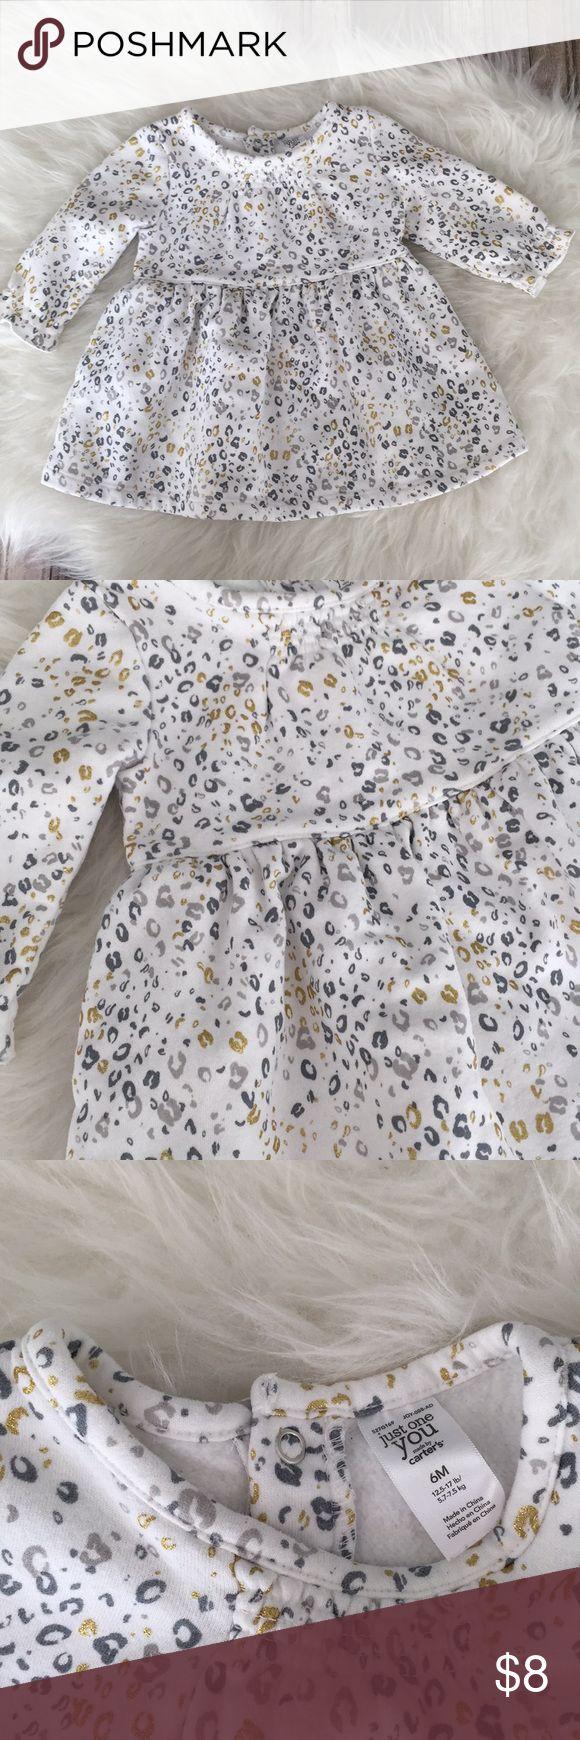 Girls gold metallic cheetah dress. Infant cheetah Good used condition, no bloomers Carter's Dresses